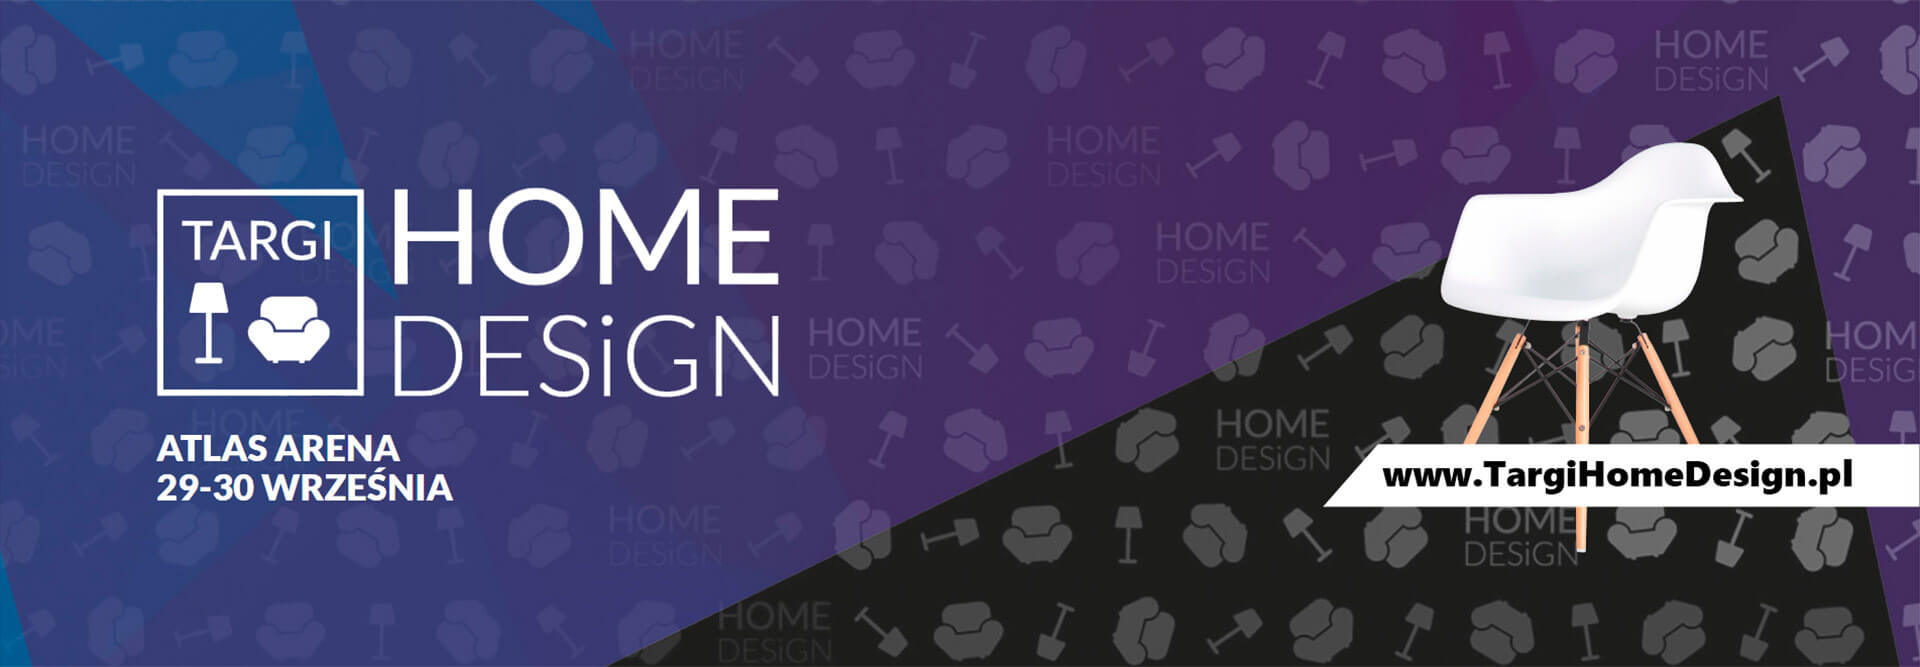 Targi Home Design jesień 2018 Łódź